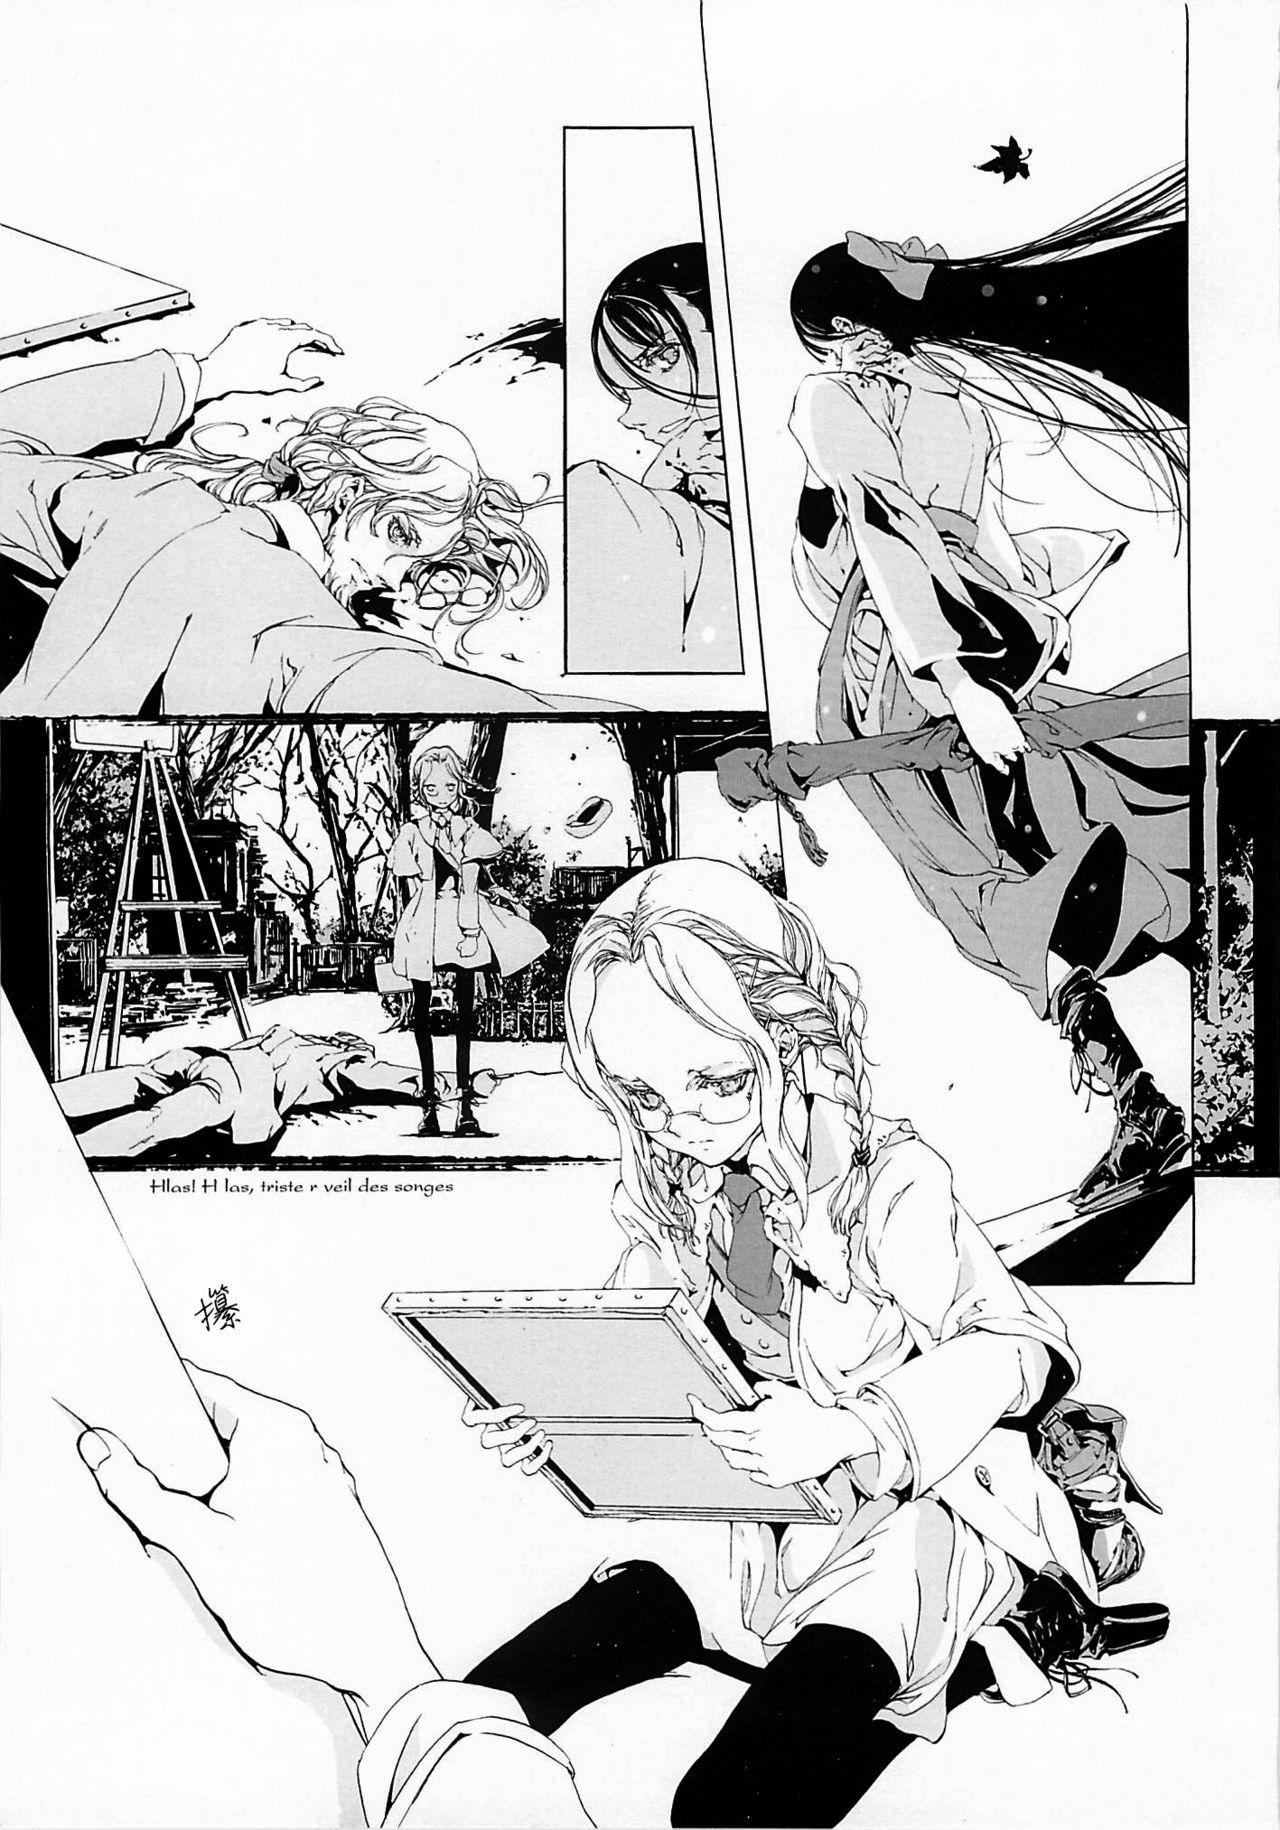 (CR37) [70 Nenshiki Yuukyuu Kikan (Endou Okito)] ORGAN-Tino  01-02[Chinese] [拾荒者汉化组] [Incomplete] 35